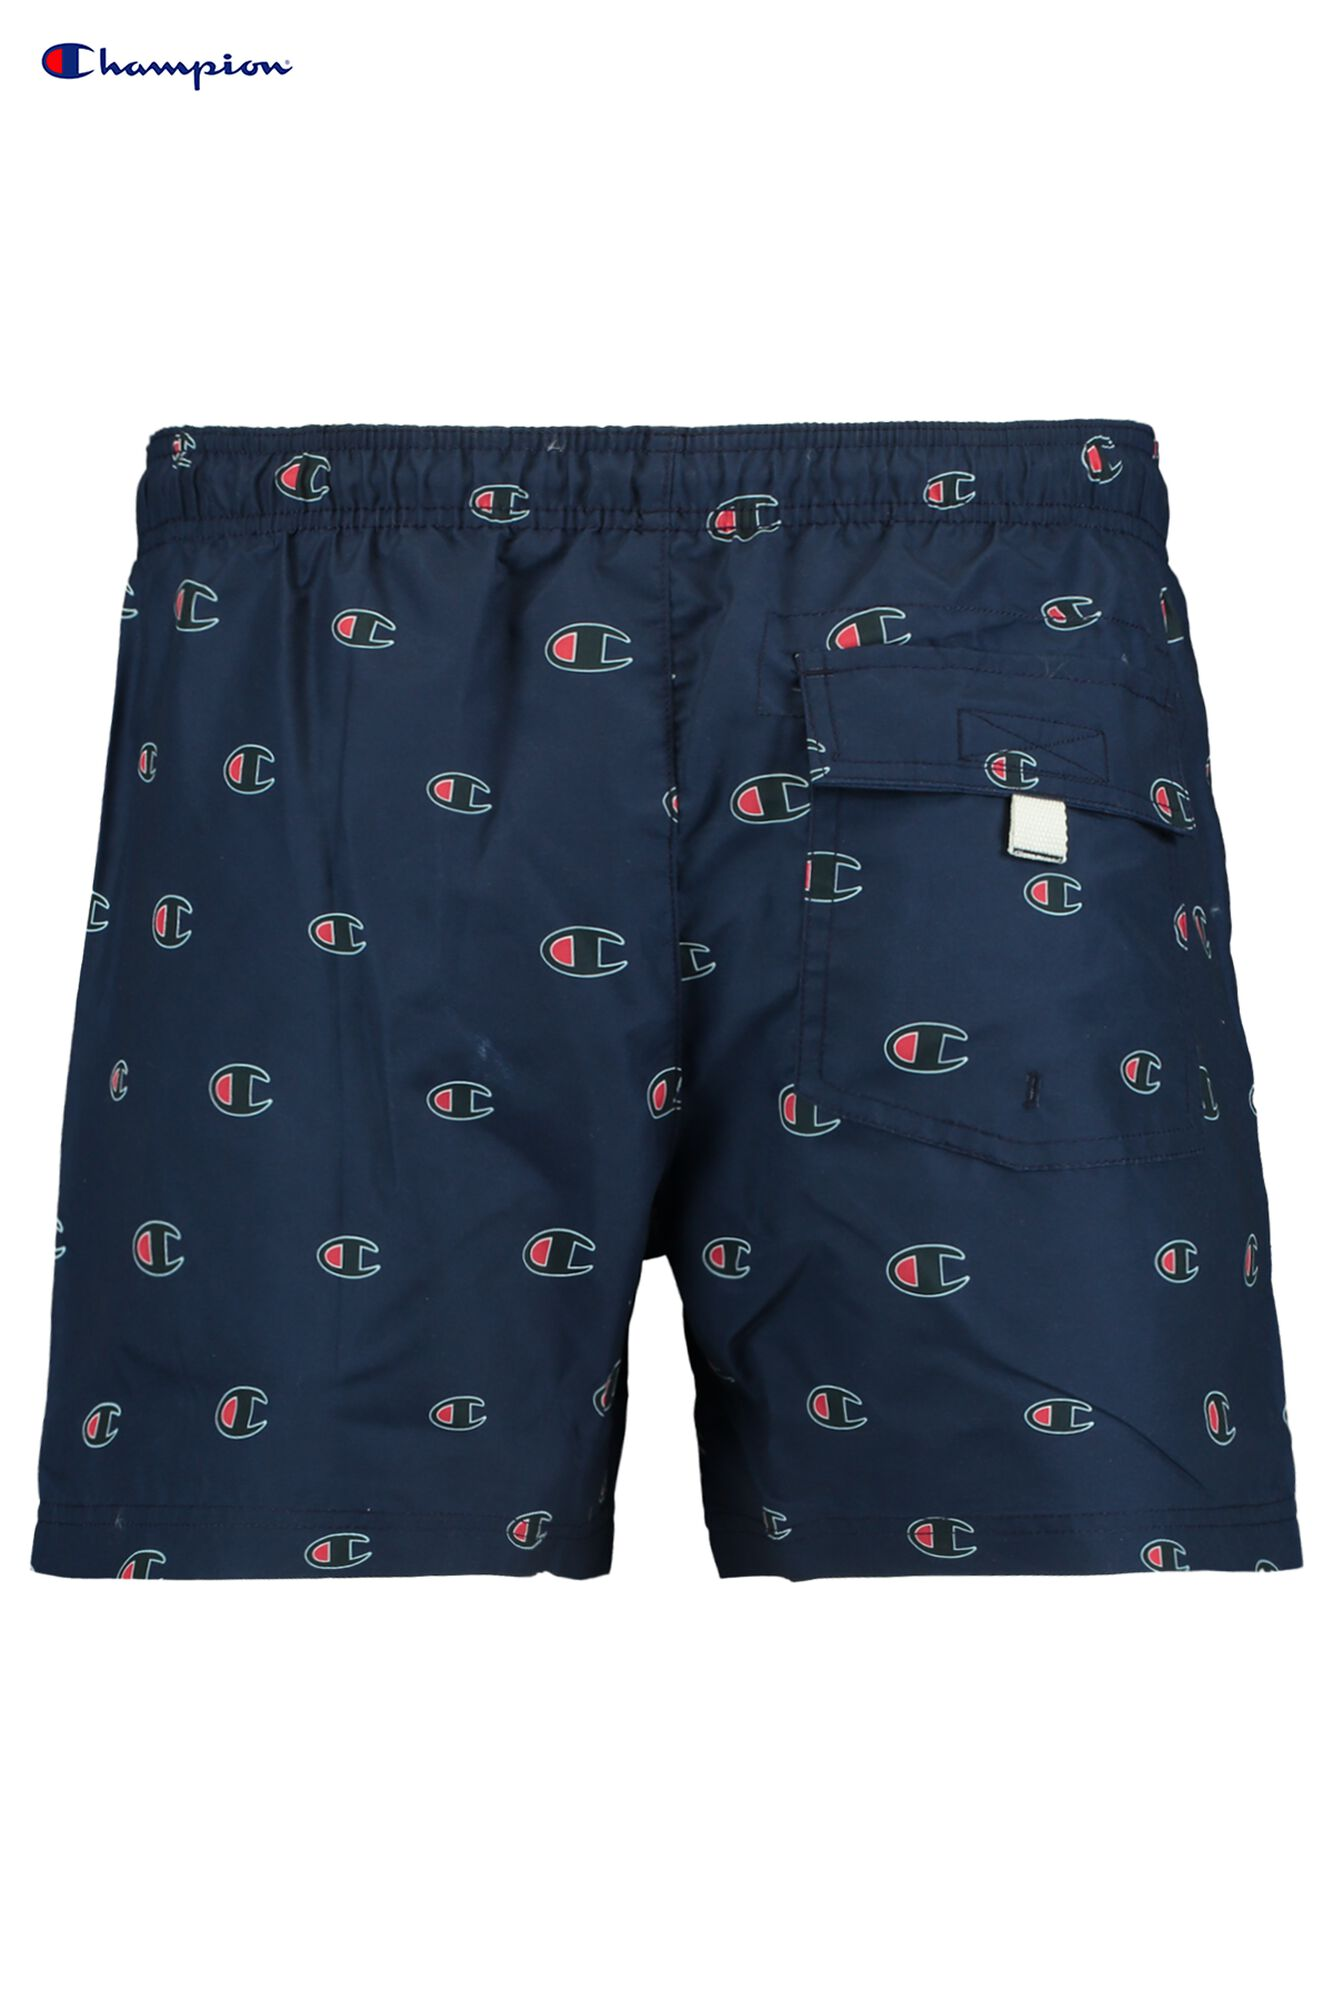 174cc043cf Men Swimming trunks Champion Beach short Multicolour Buy Online